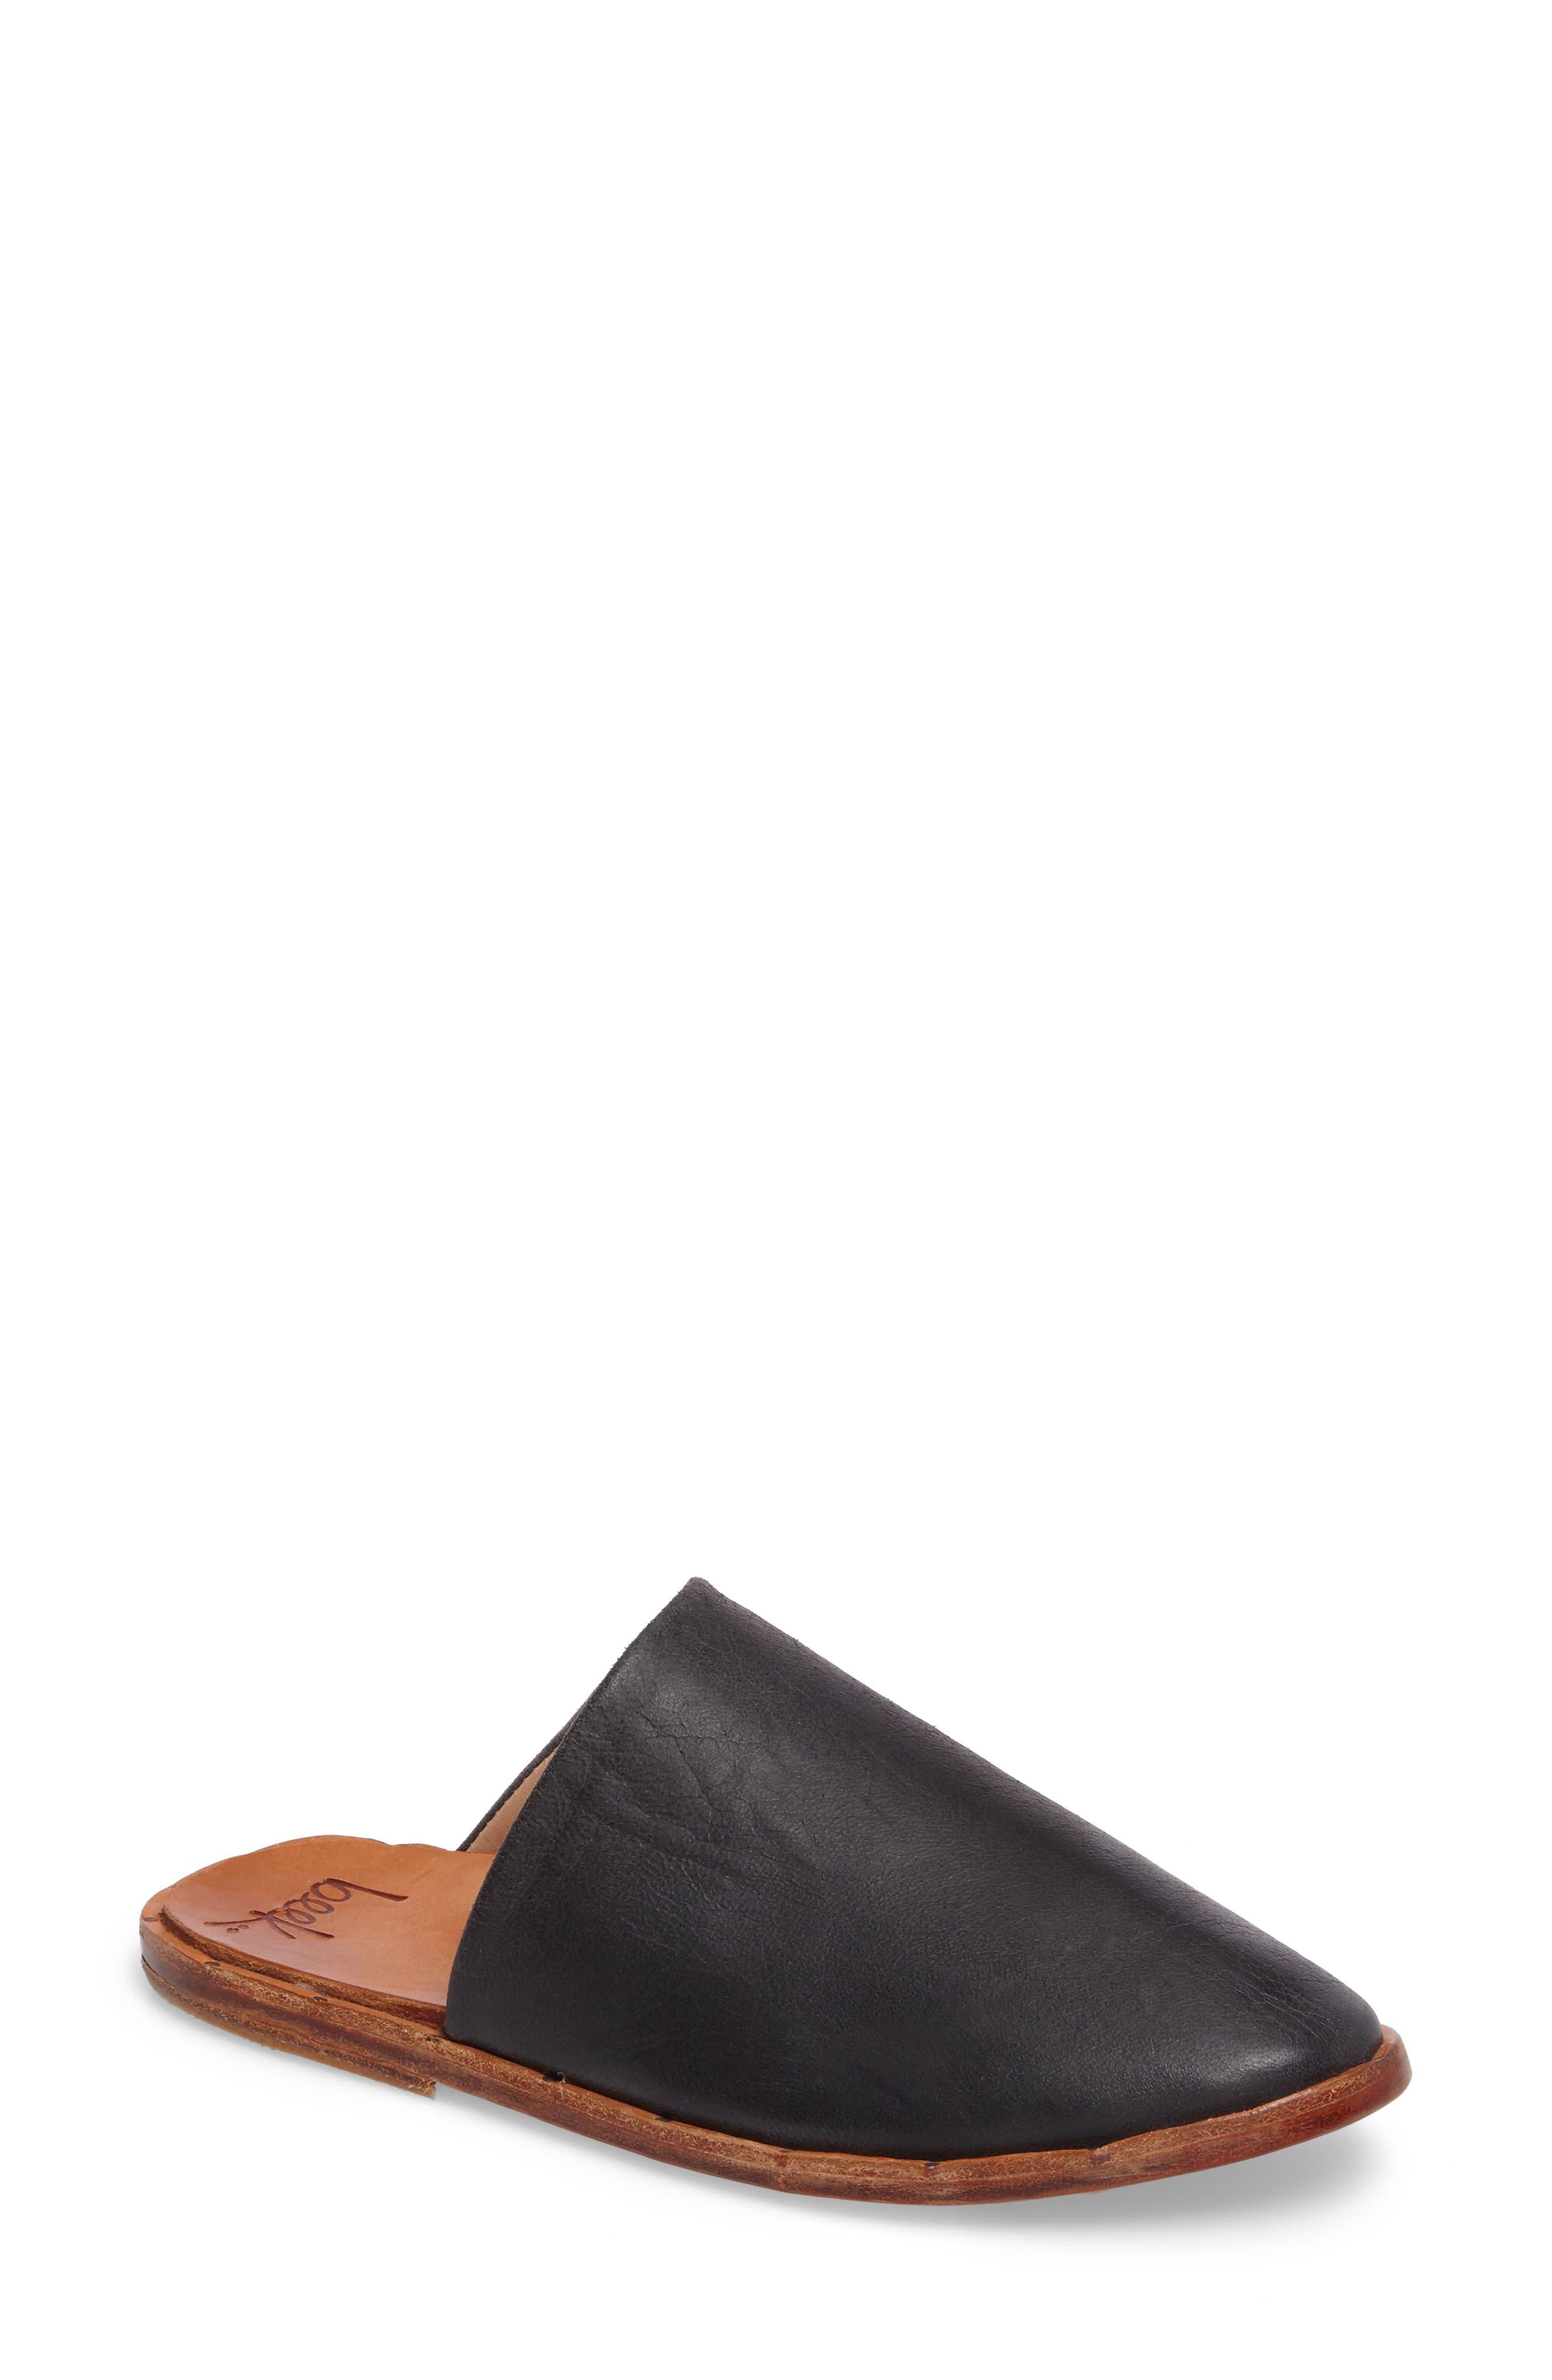 Seagull Mule,                             Main thumbnail 1, color,                             Vintage Black Leather